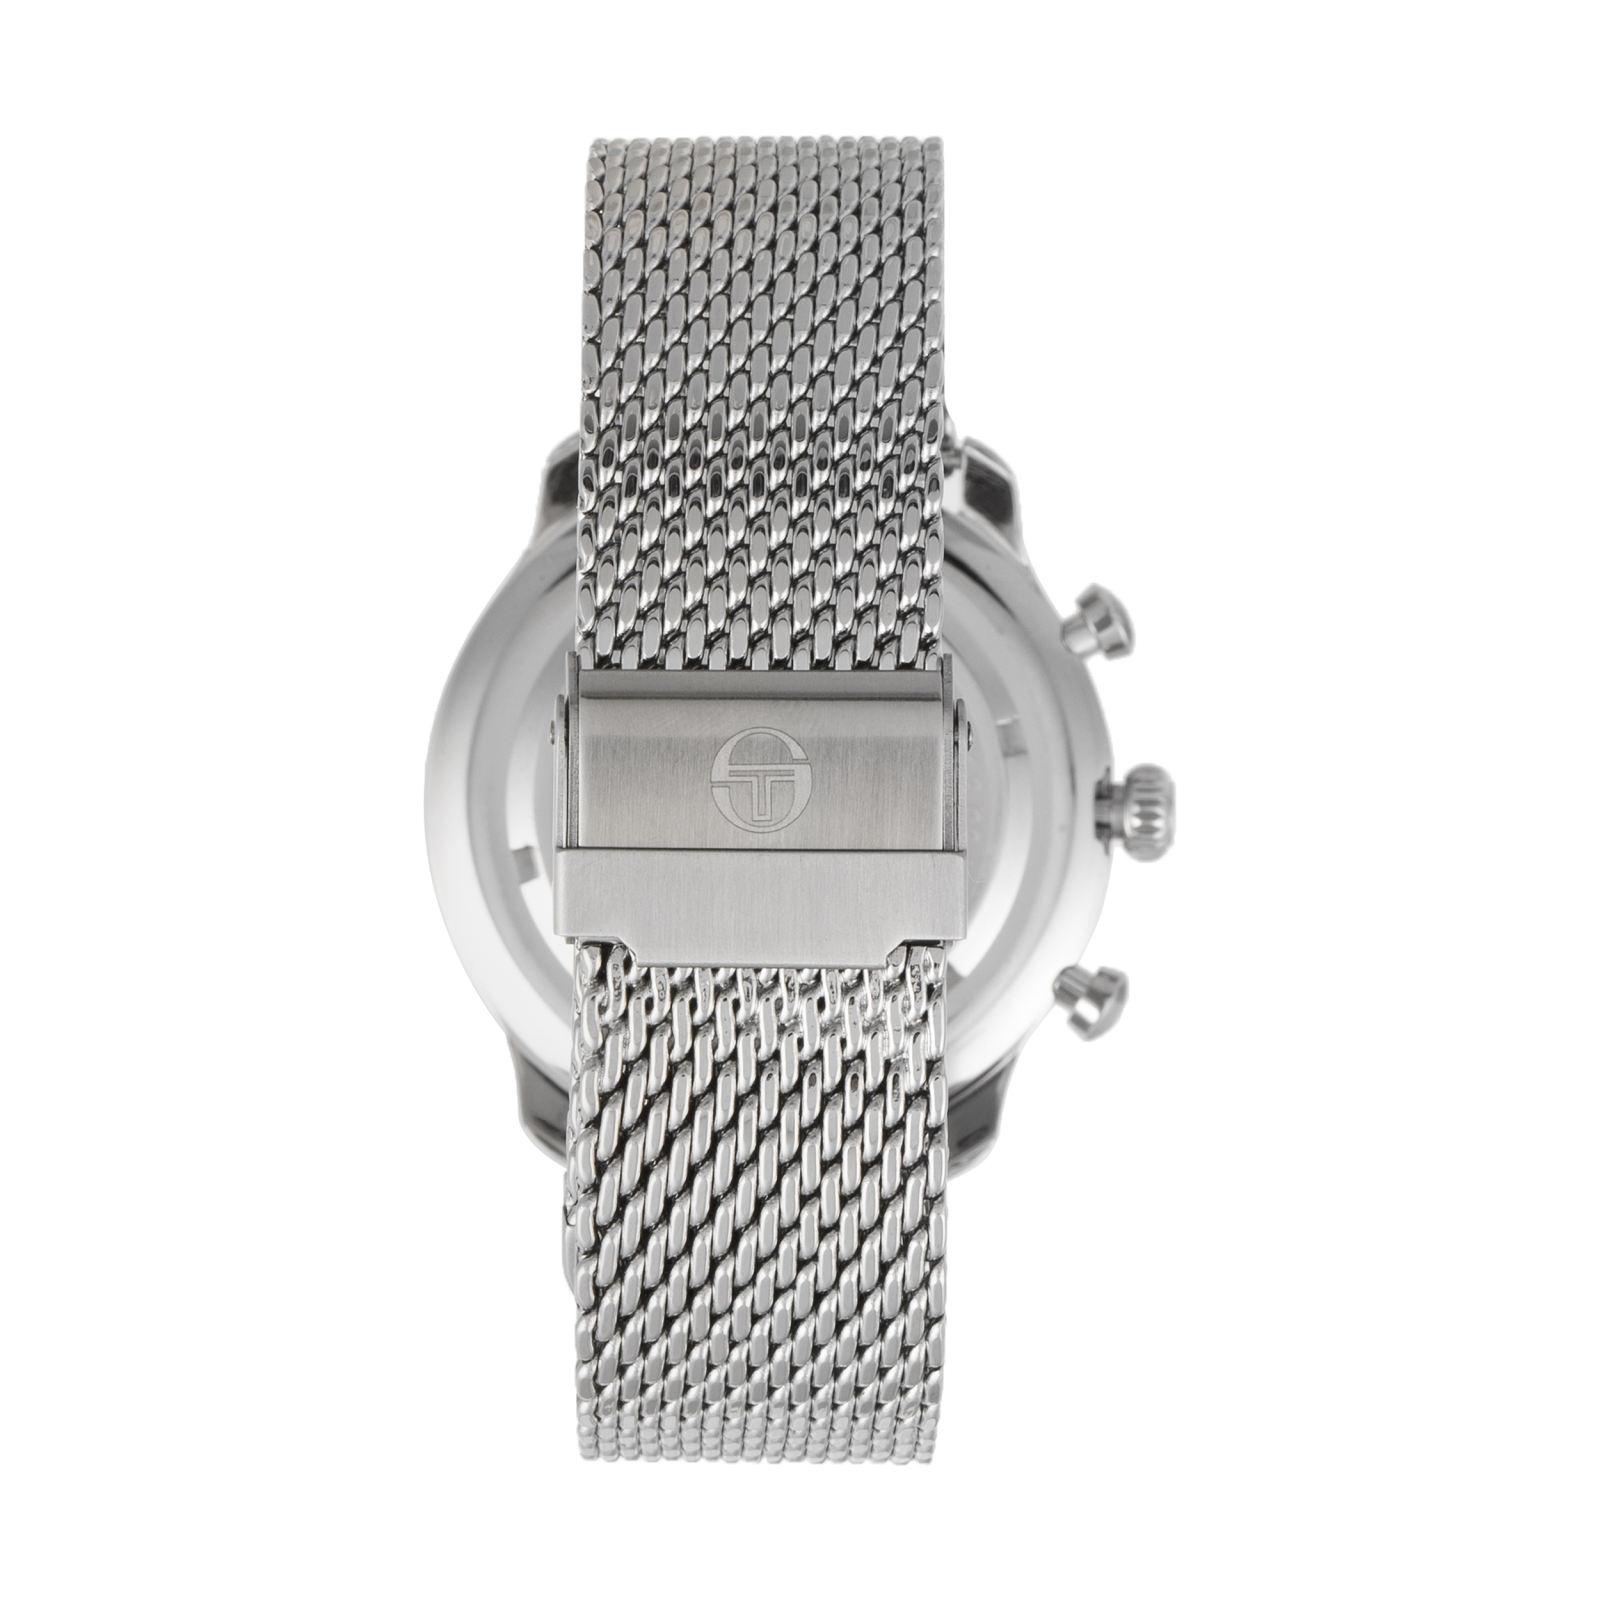 ساعت مچی عقربهای مردانه سرجیو تاچینی کد ST.2.112.02